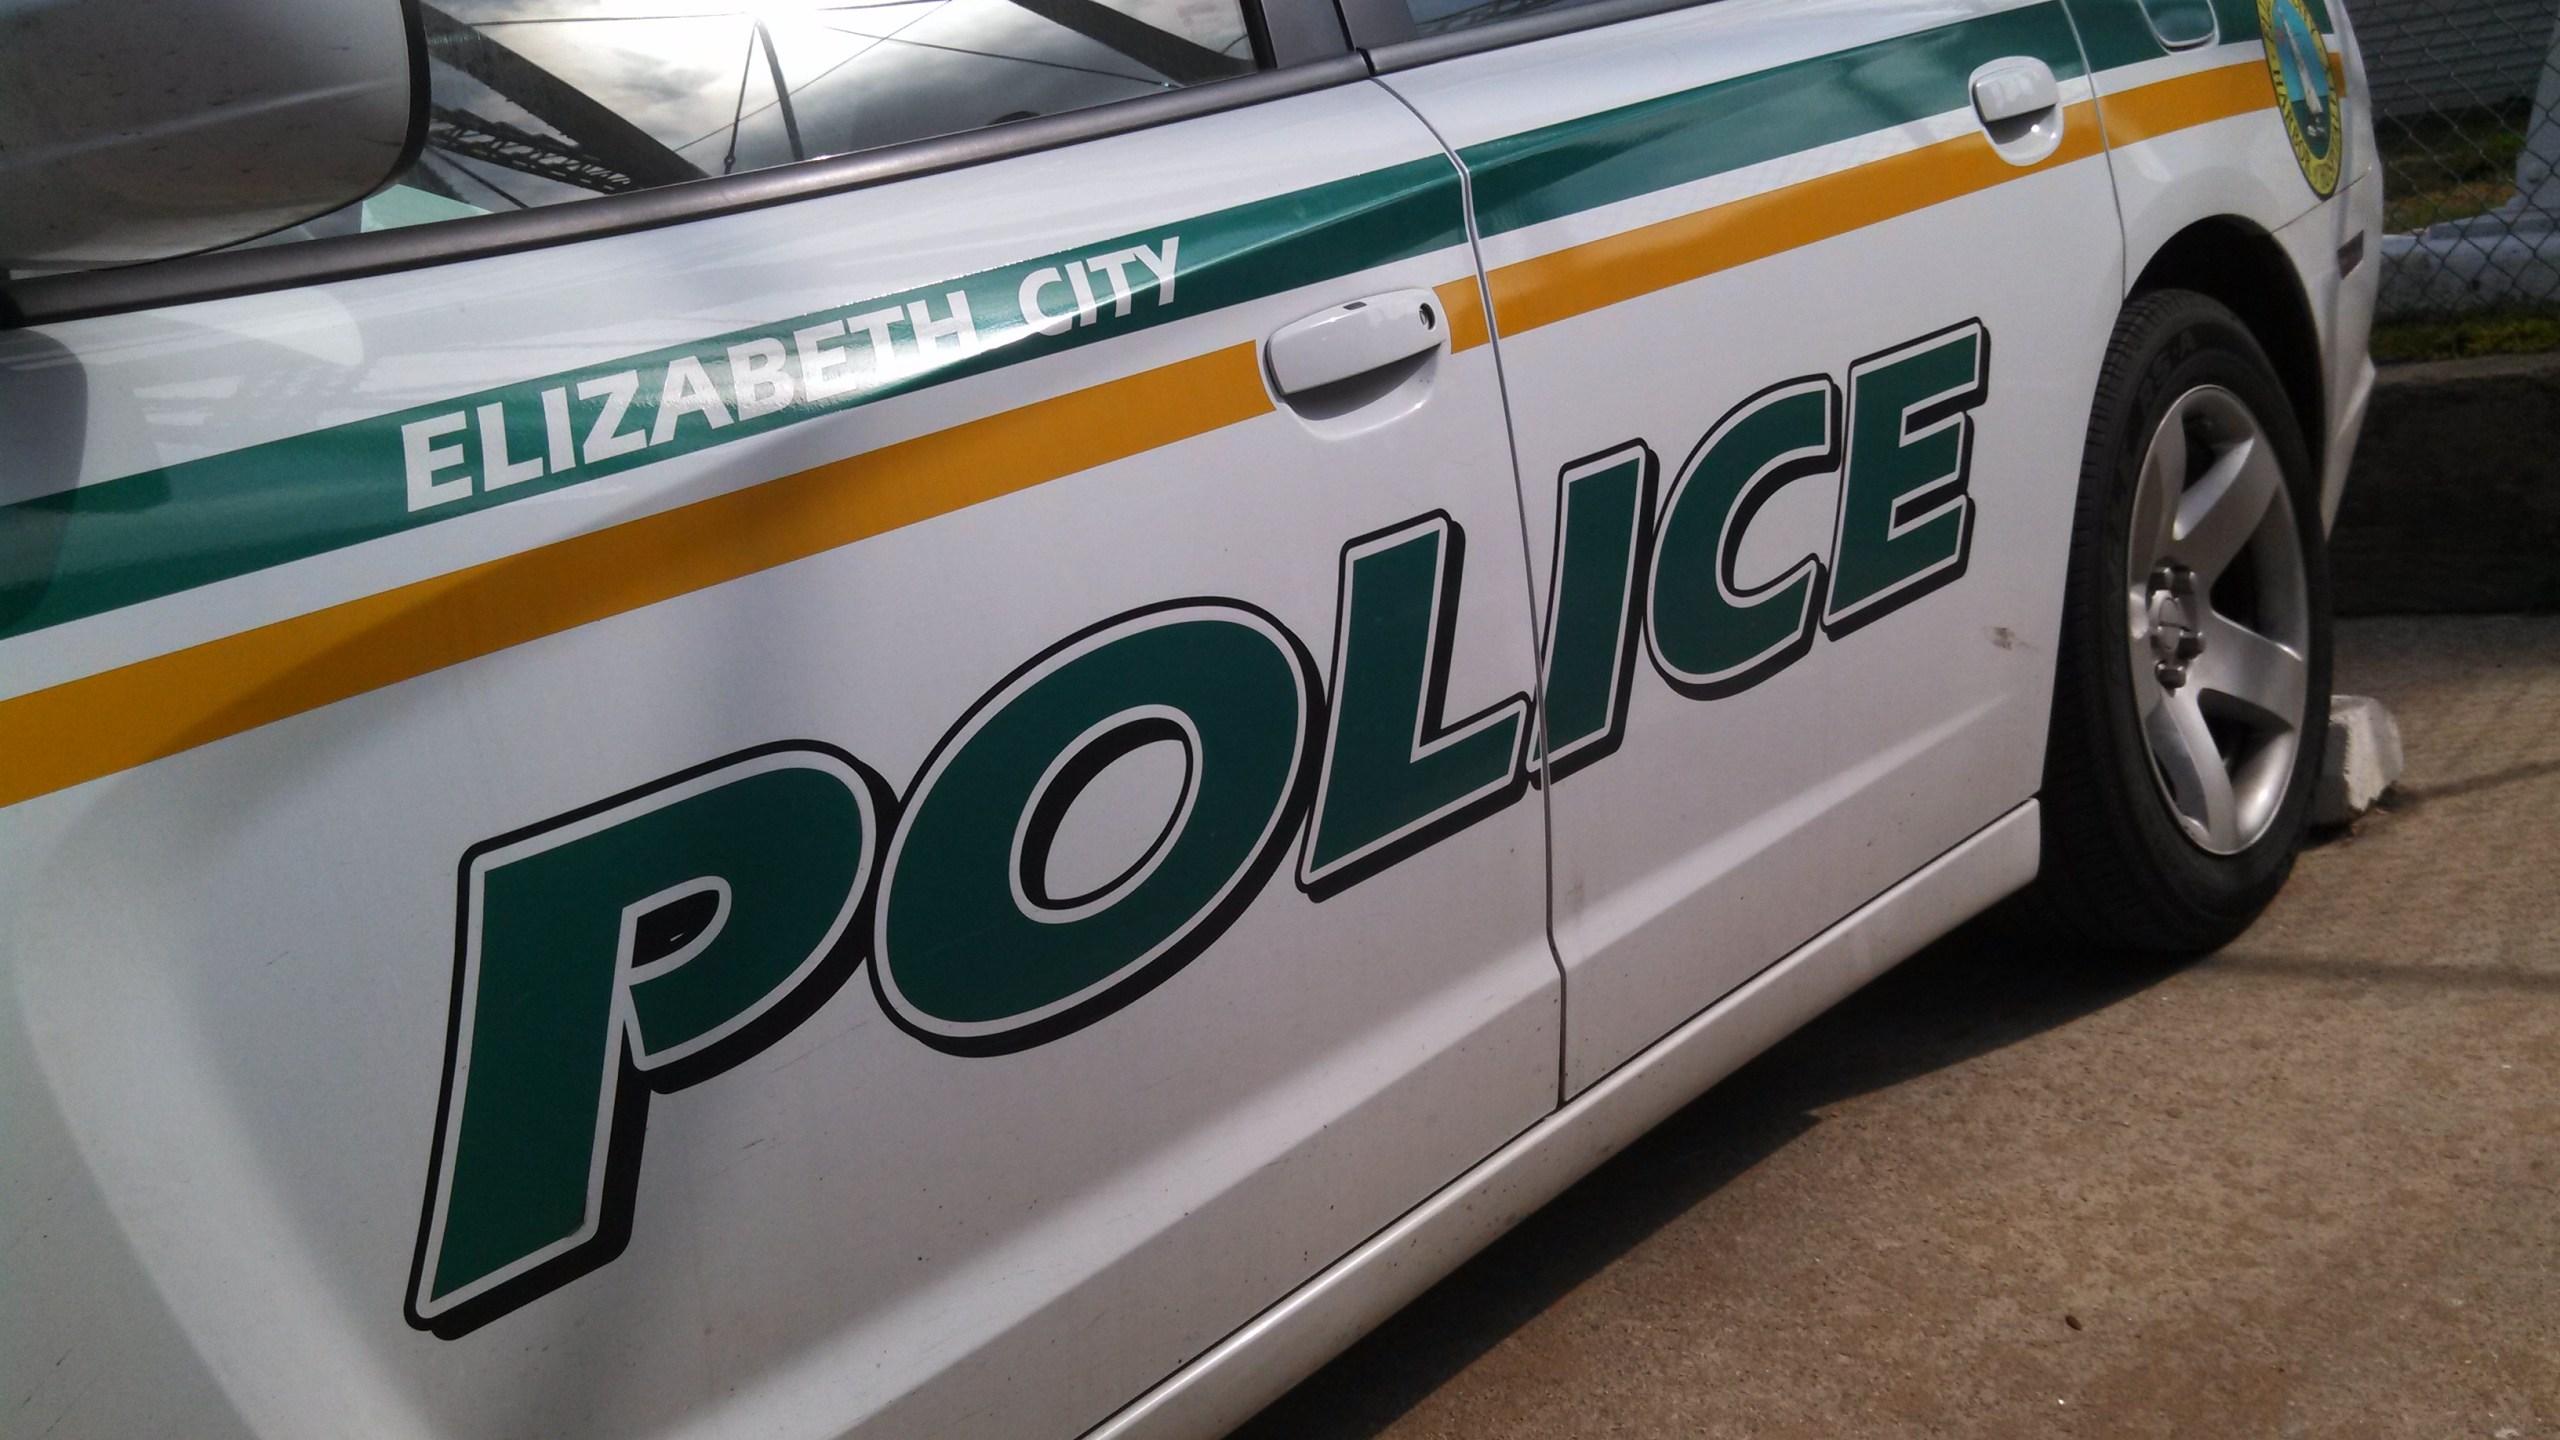 Elizabeth City Police Generic